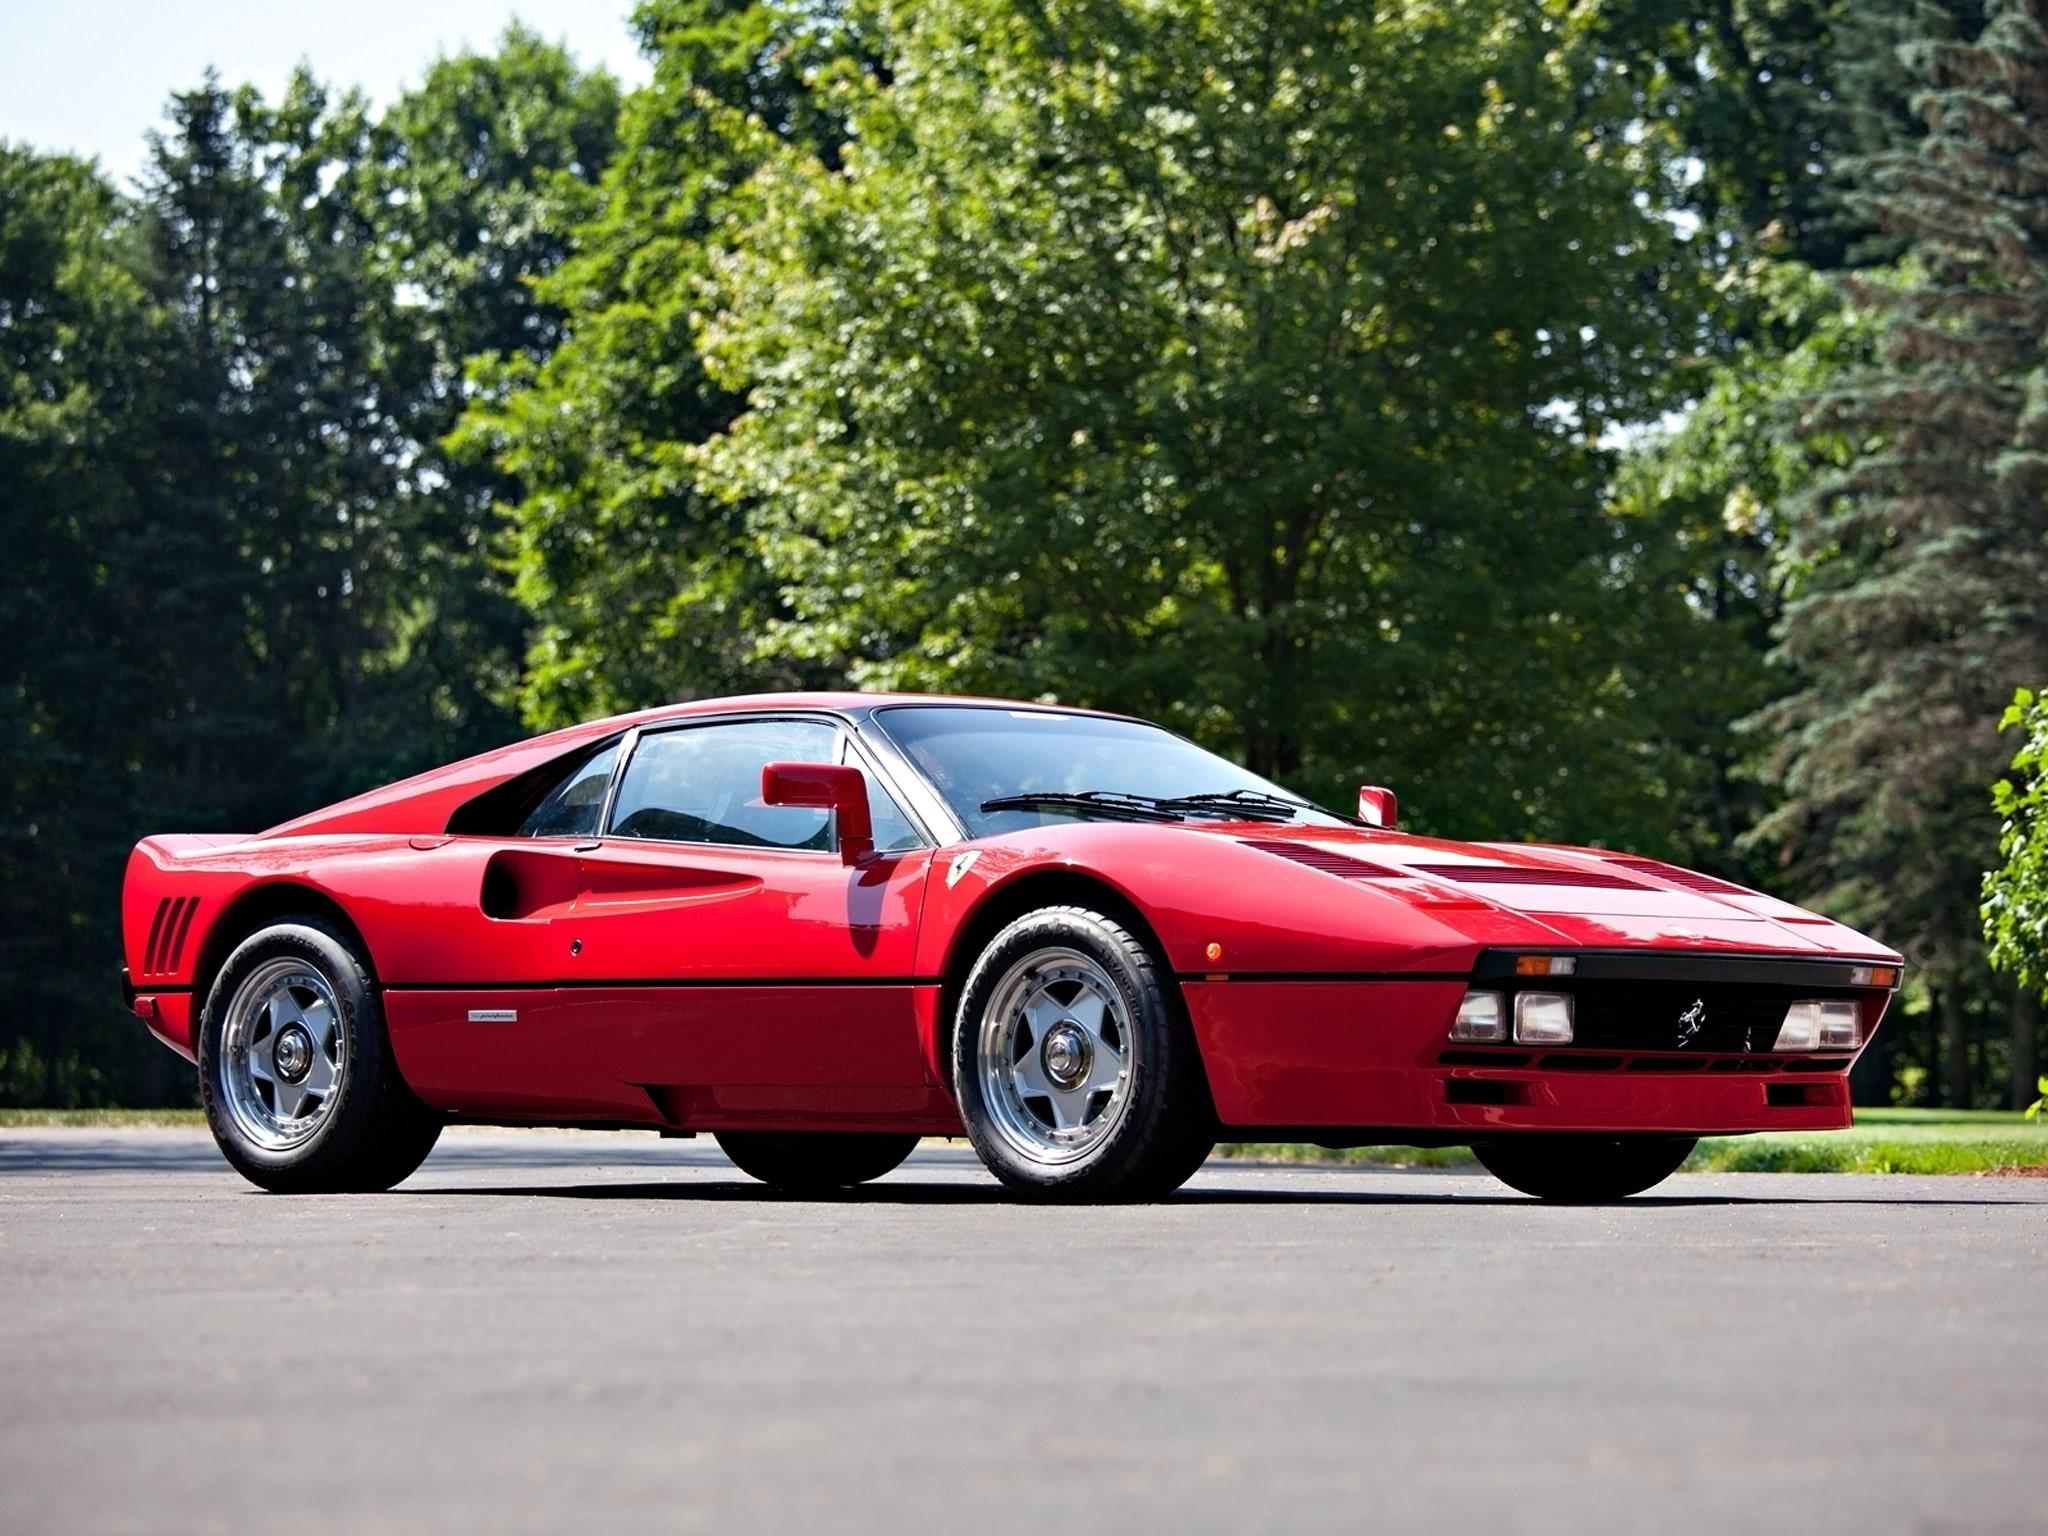 1984 Ferrari GTO Wallpapers hd